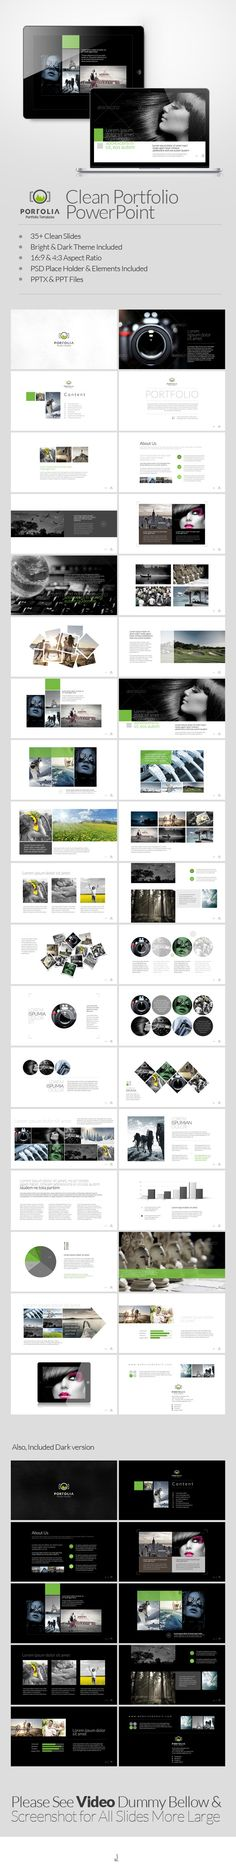 Portolia Multipurpose Clean Portfolio Powerpoint - Business PowerPoint Templates